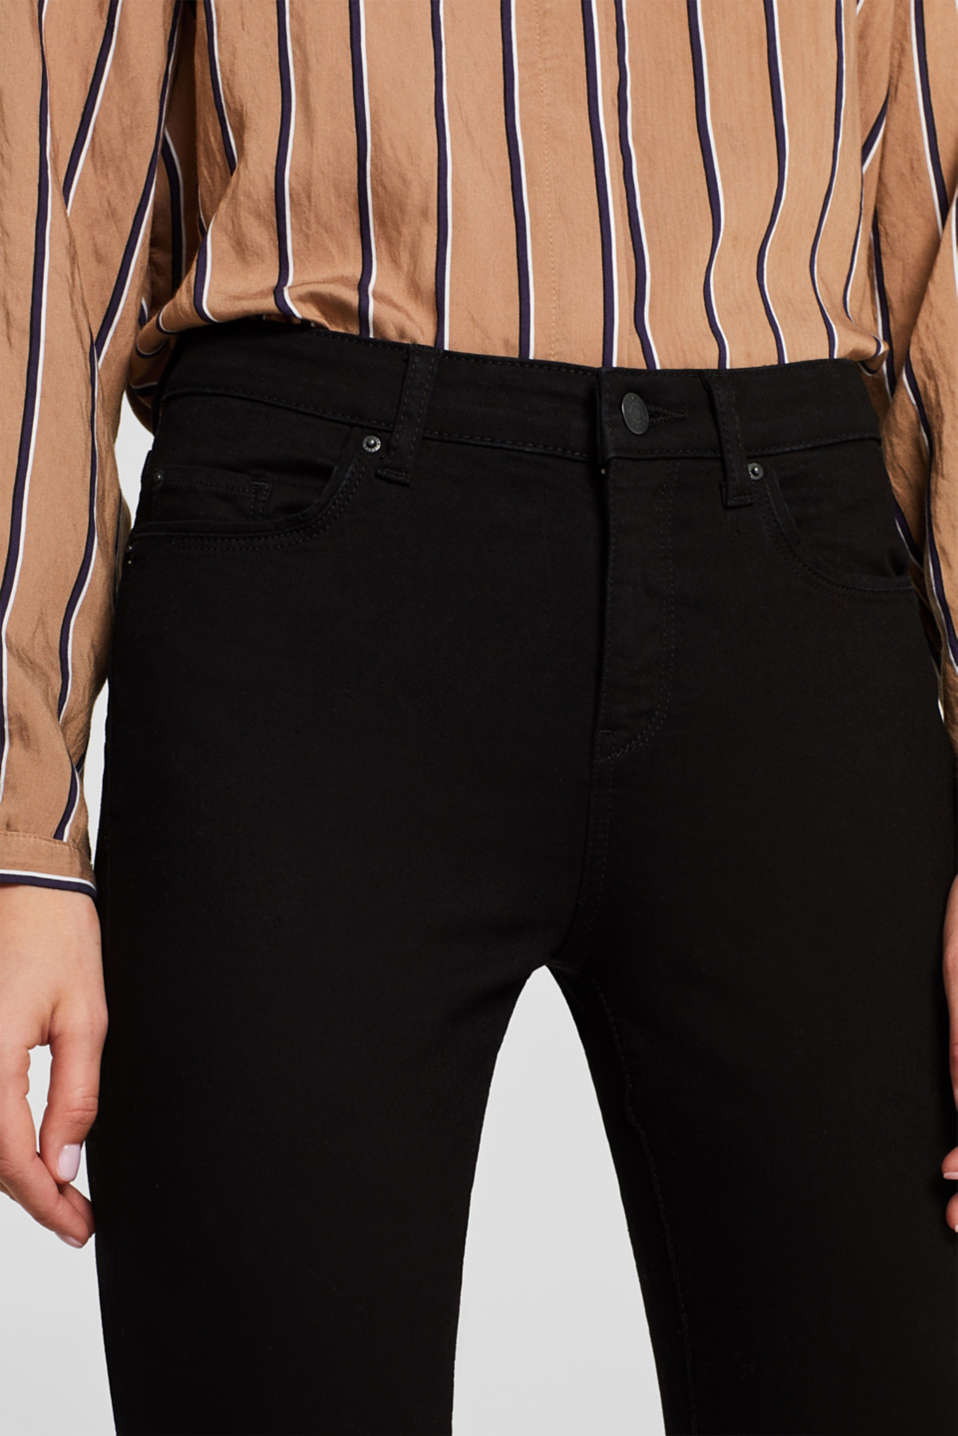 Pants denim, BLACK DARK WASH, detail image number 5